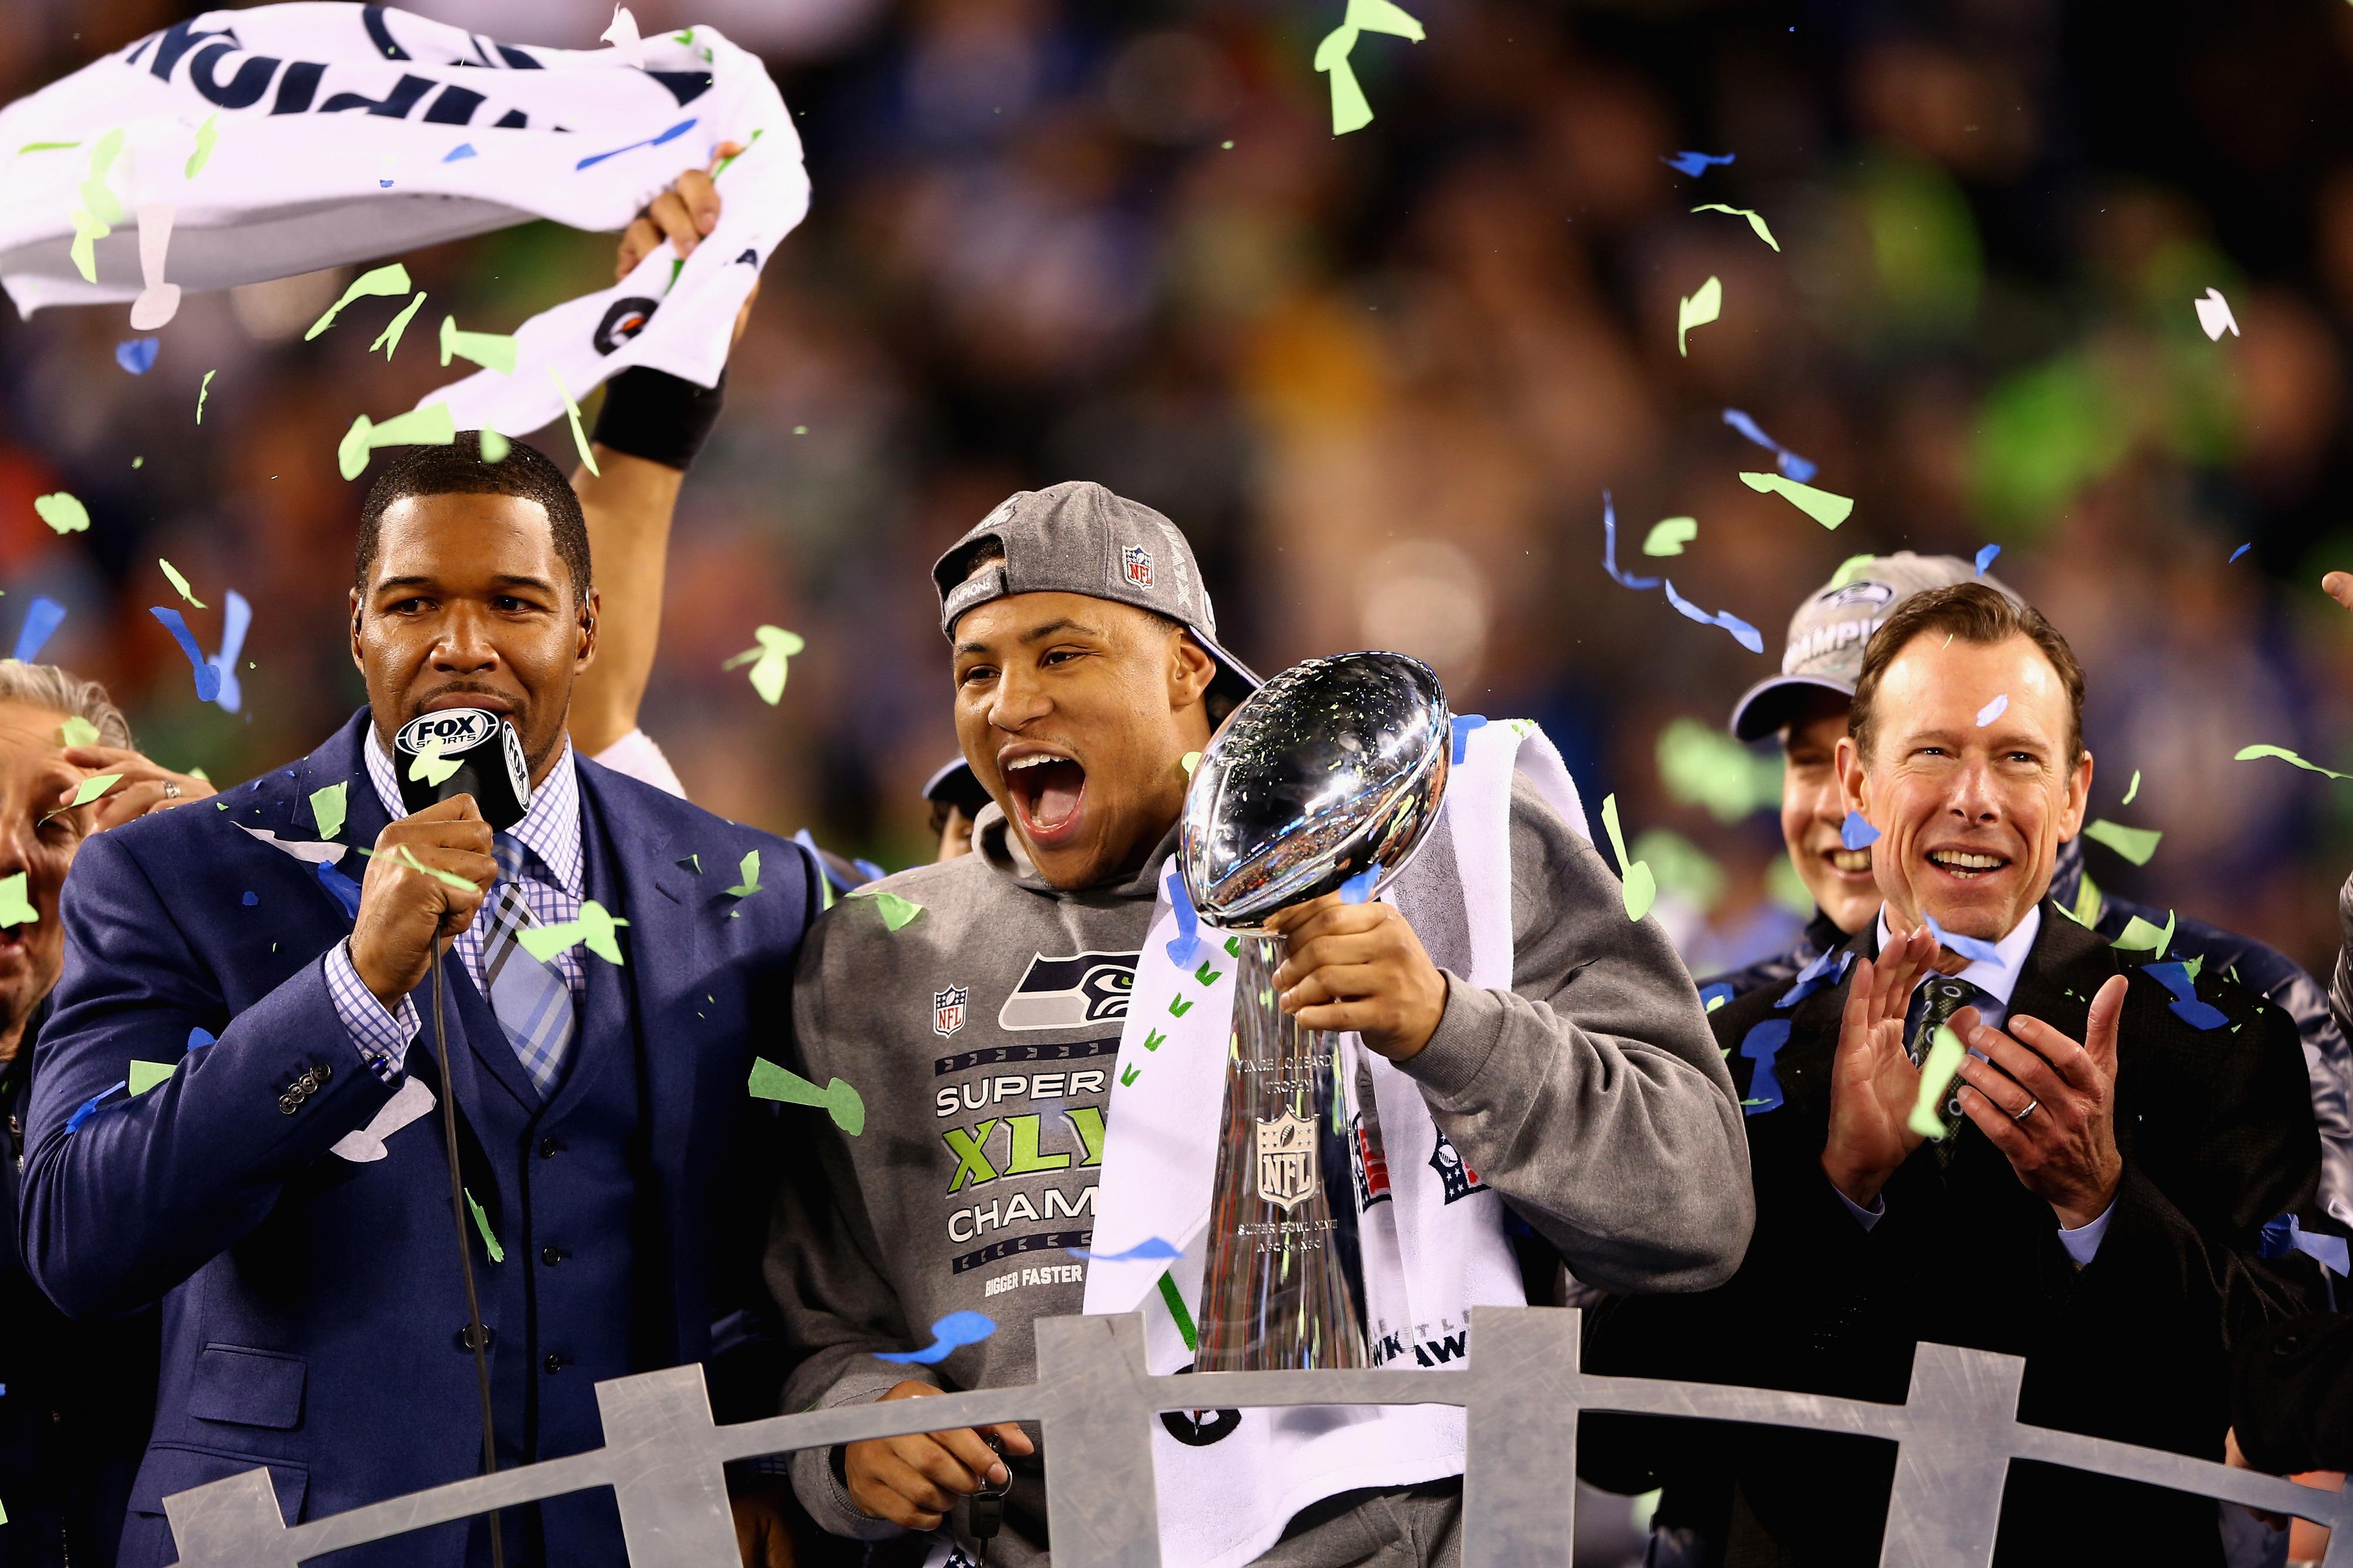 Super Bowl XLVIII: Seahawks celebrate championship